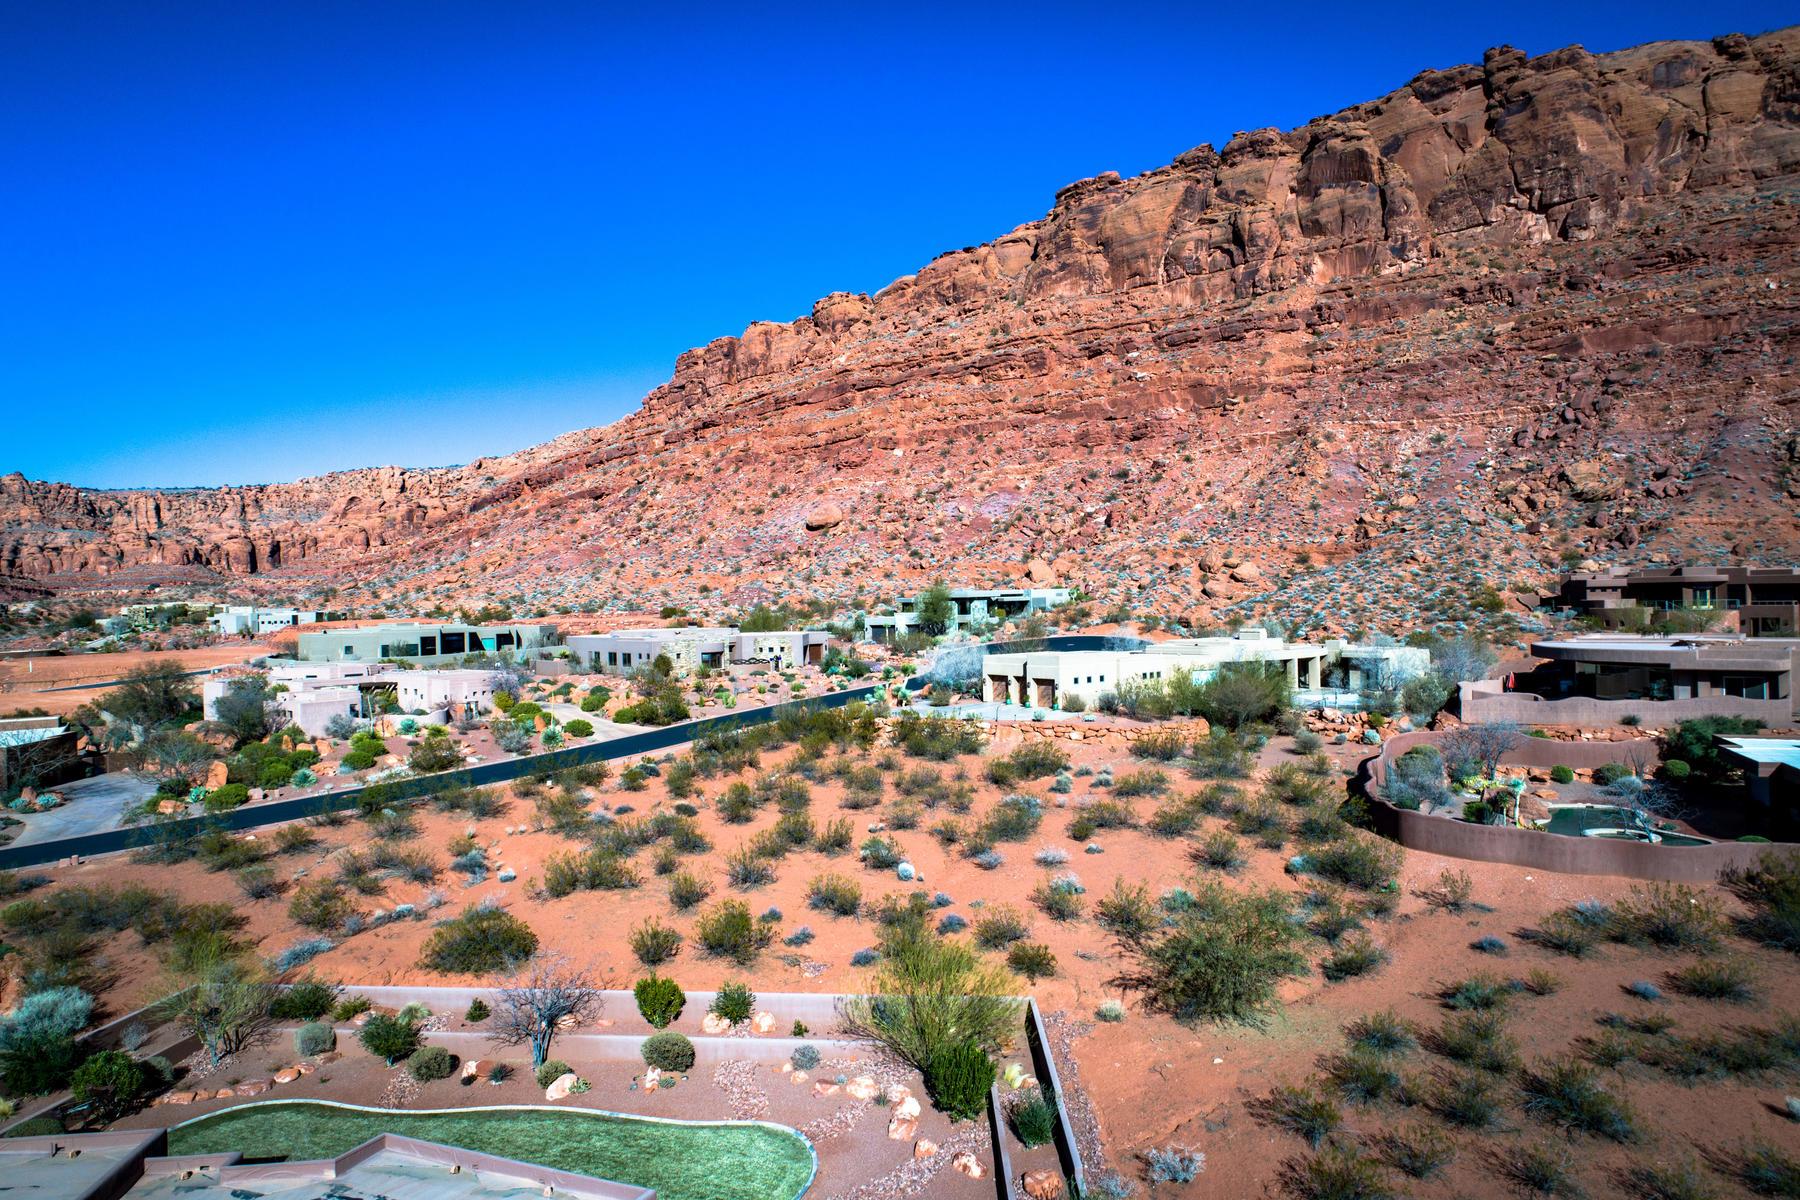 Beautiful Scenery - Private Cul-de-sac 2277 W Acowa Circle Lot 8 St. George, Utah 84770 United States